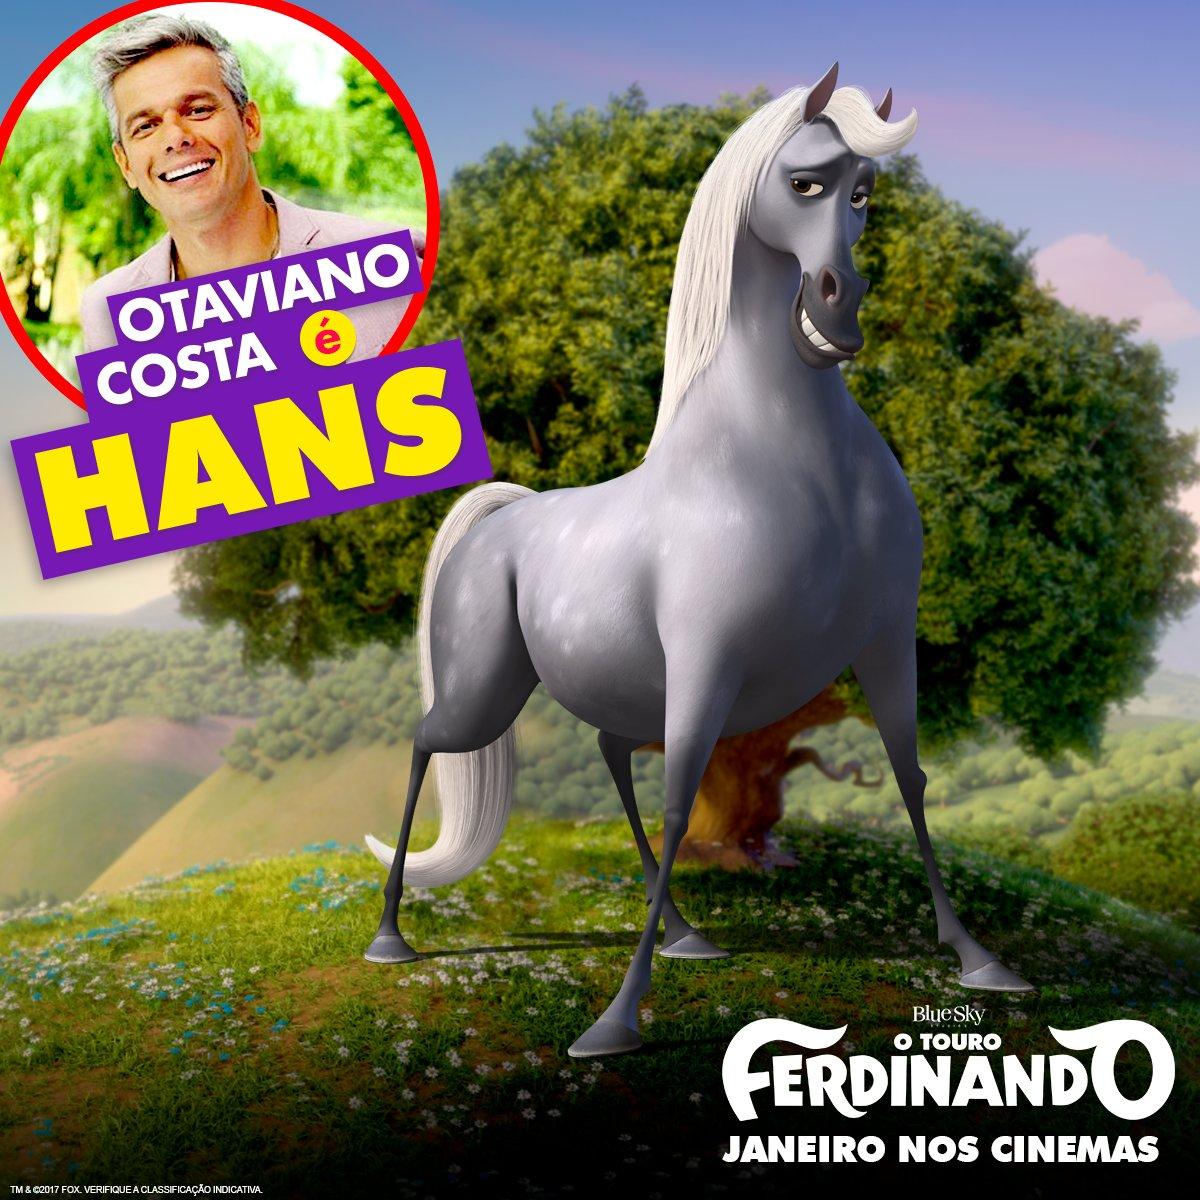 Otaviano Costa voz do Hans versao brasileira